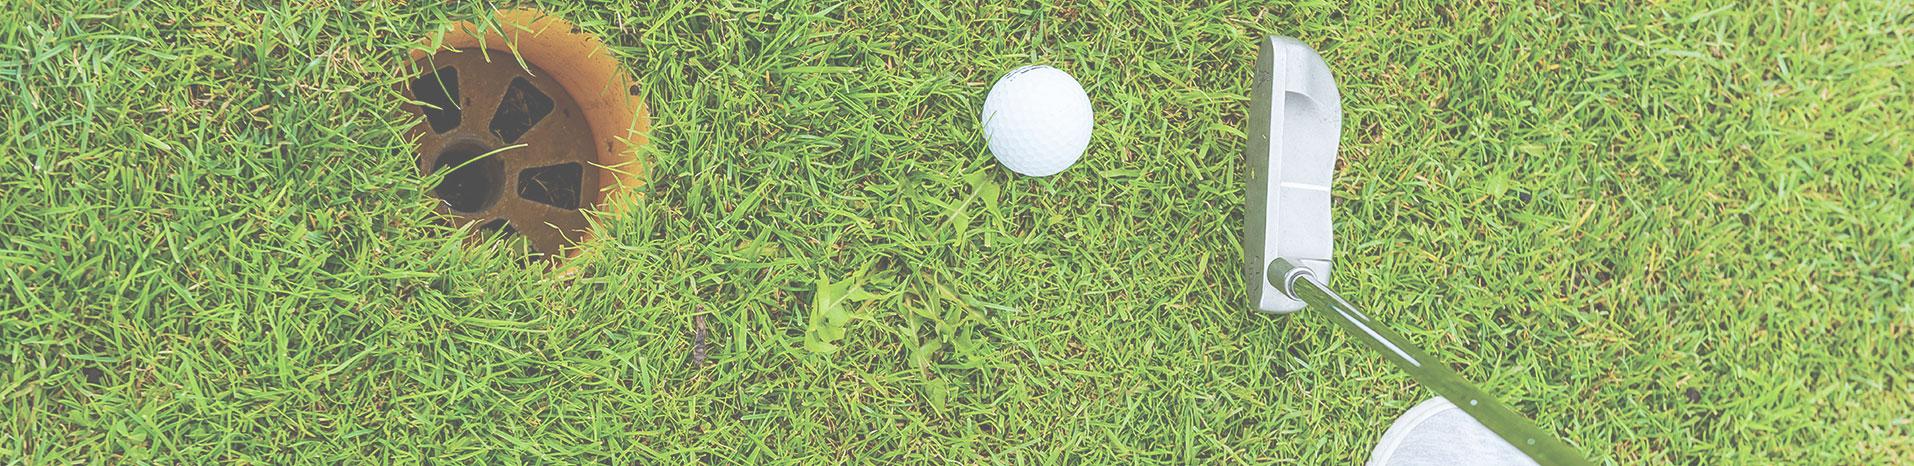 Golf-Slider-6